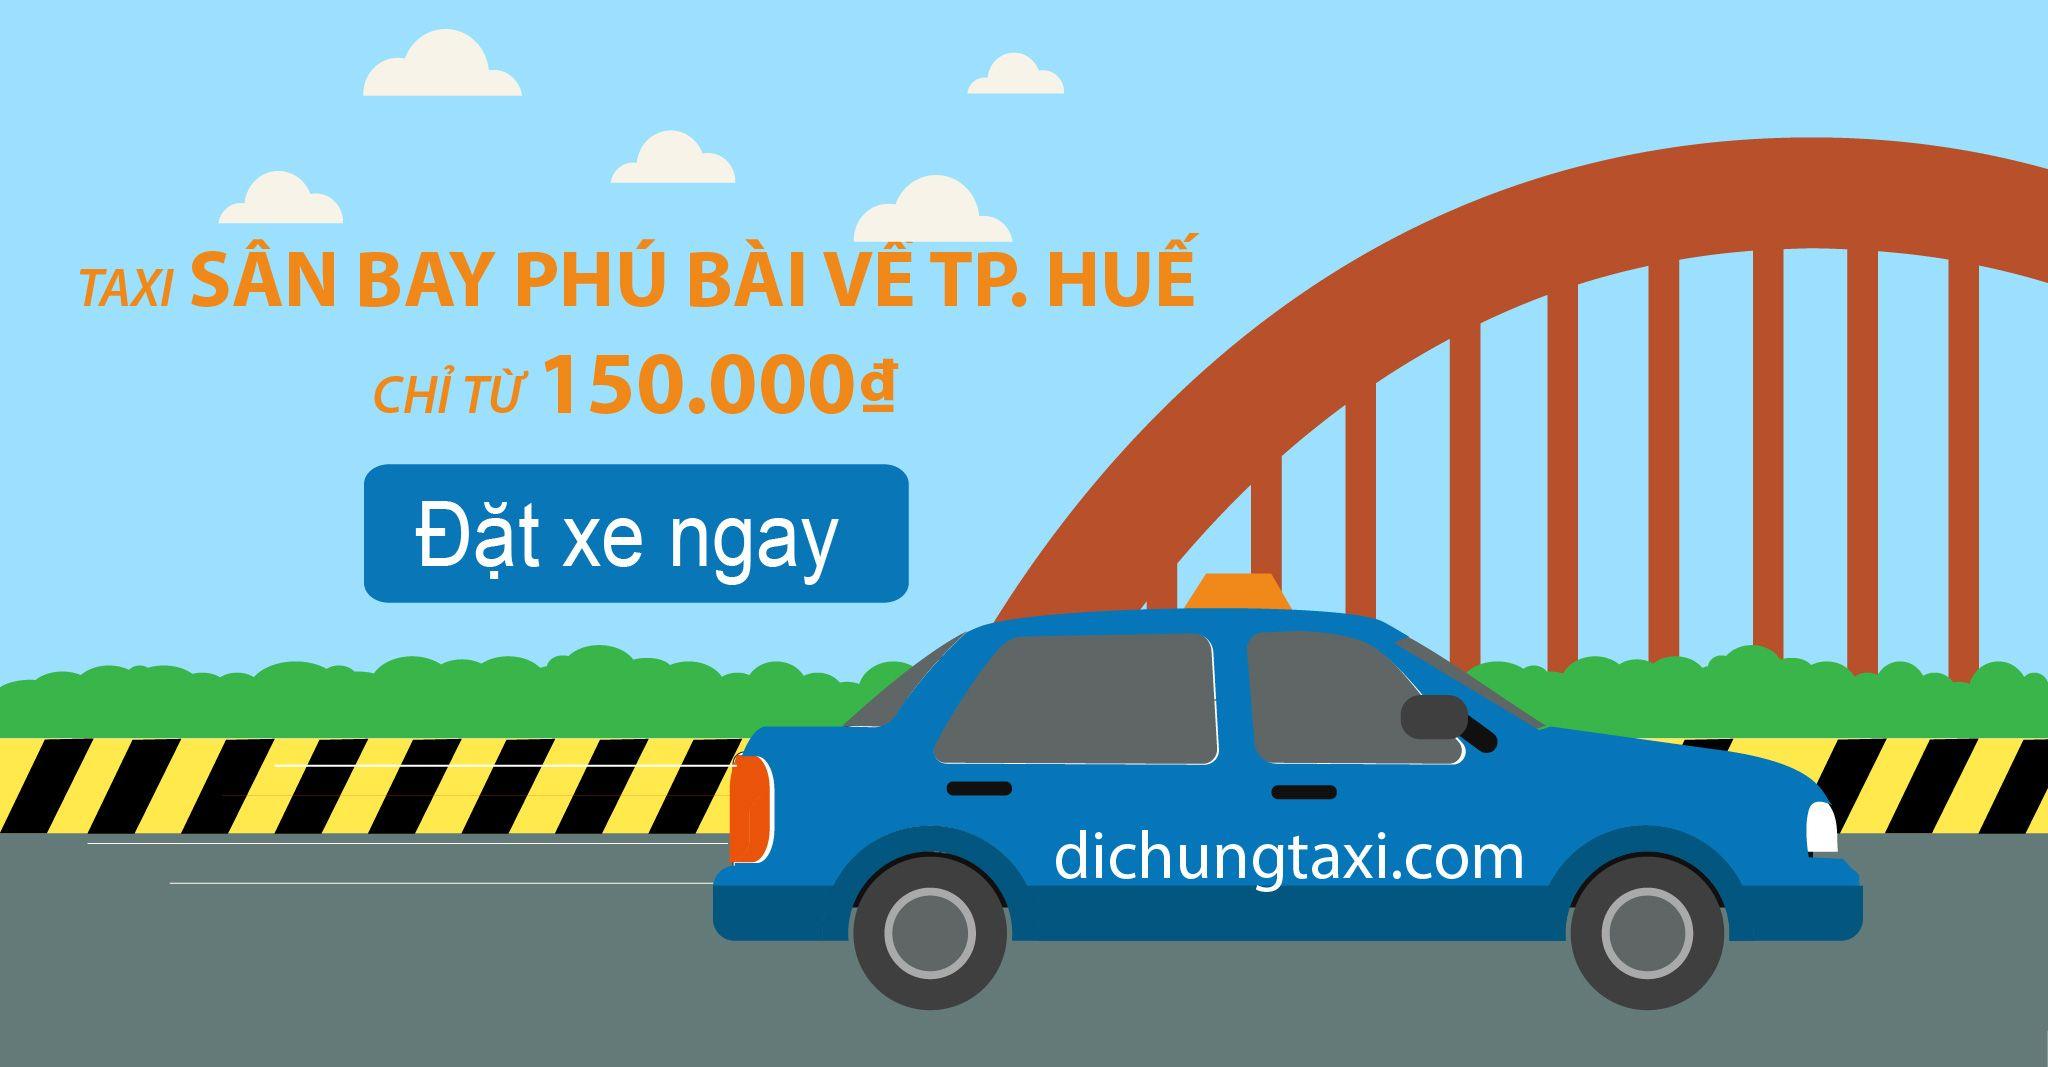 taxi-san-bay-phu-bai-ve-thanh-pho-hue